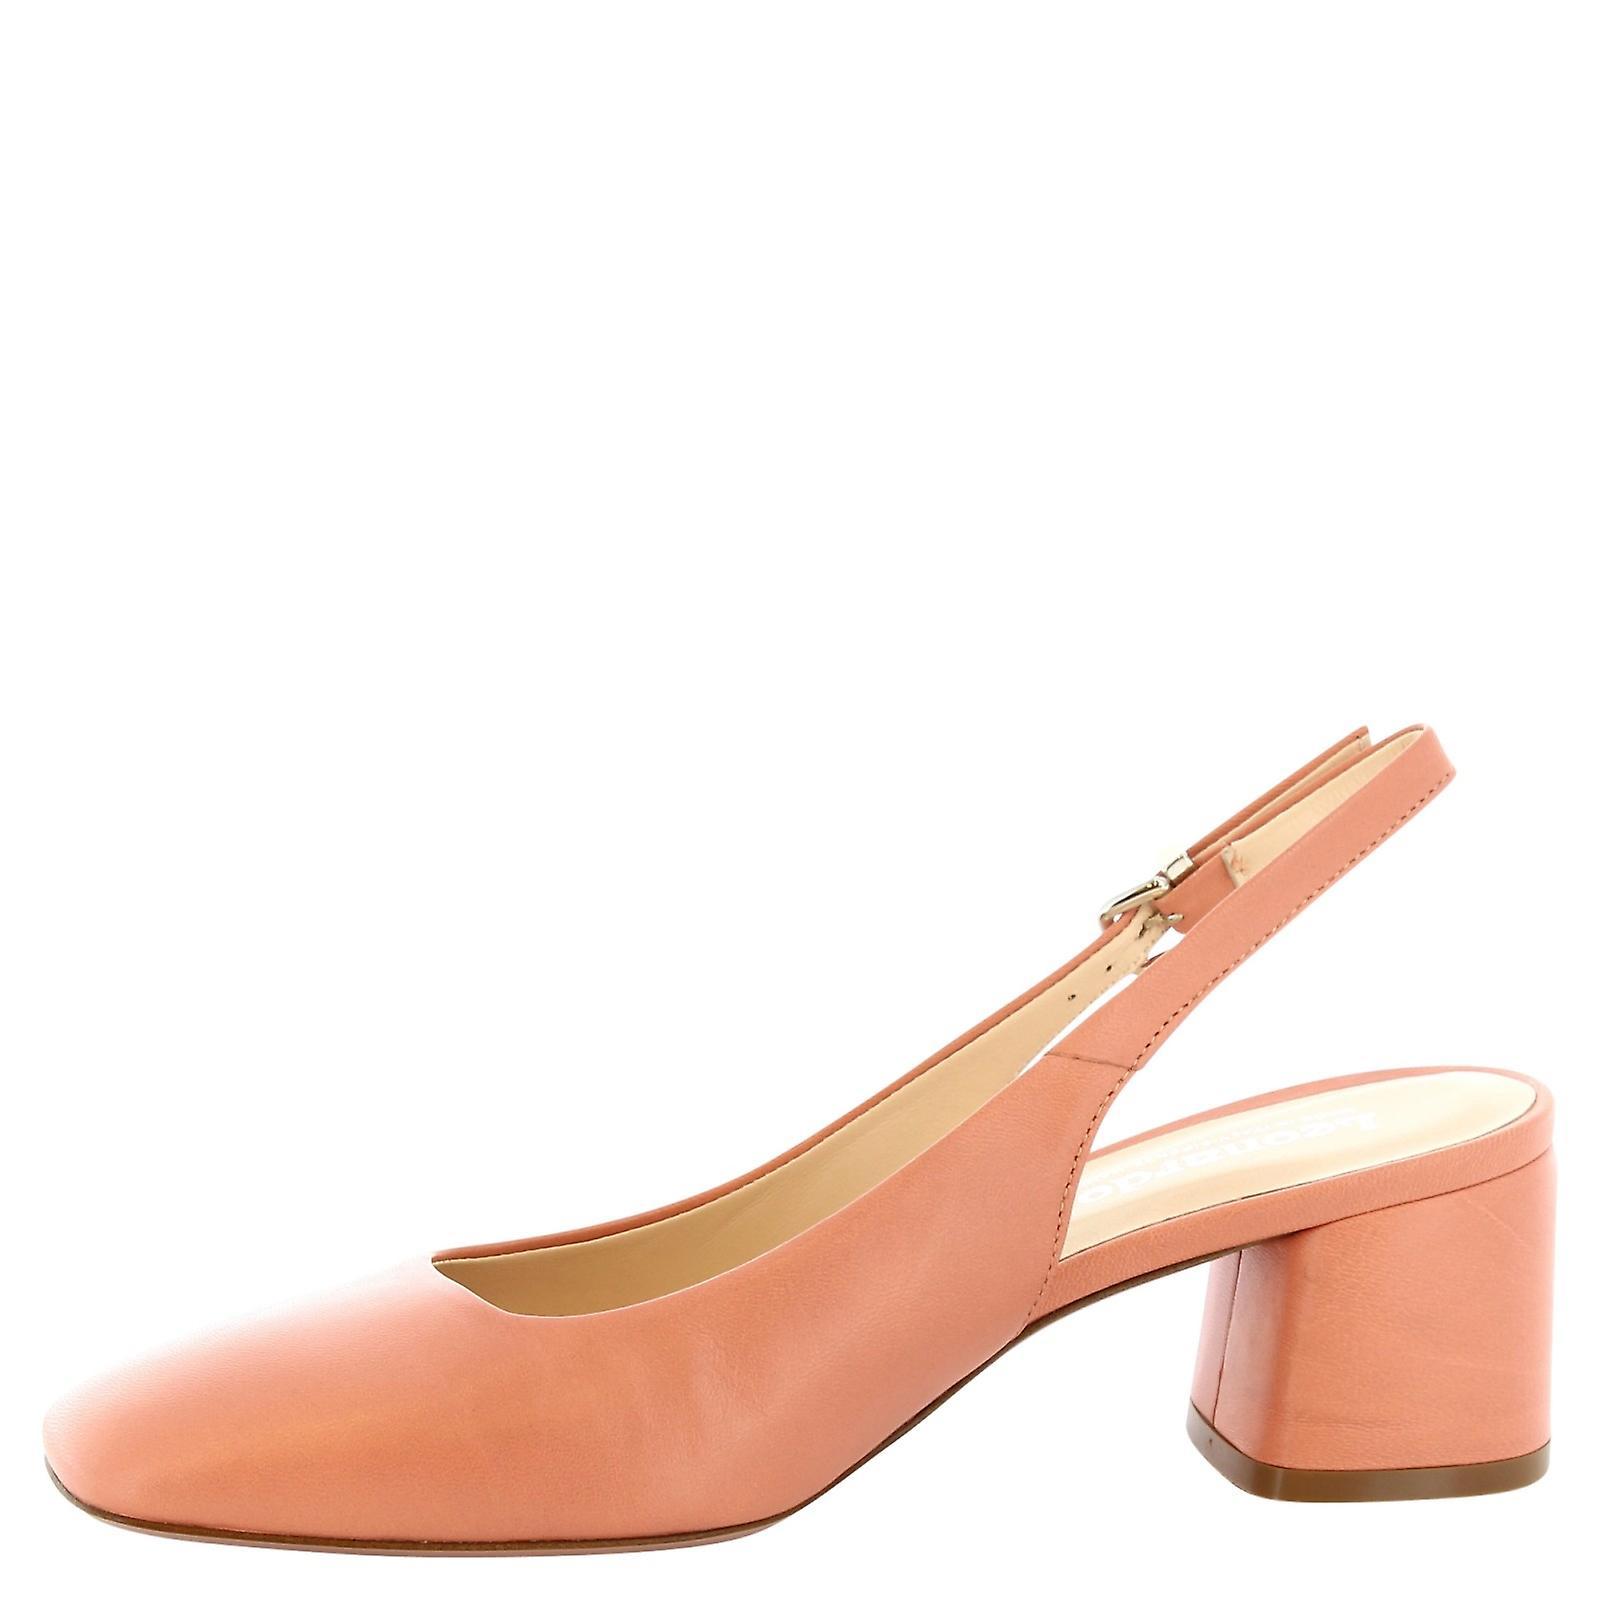 Leonardo Shoes Women's handmade slingbacks block heel in salmon calf leather